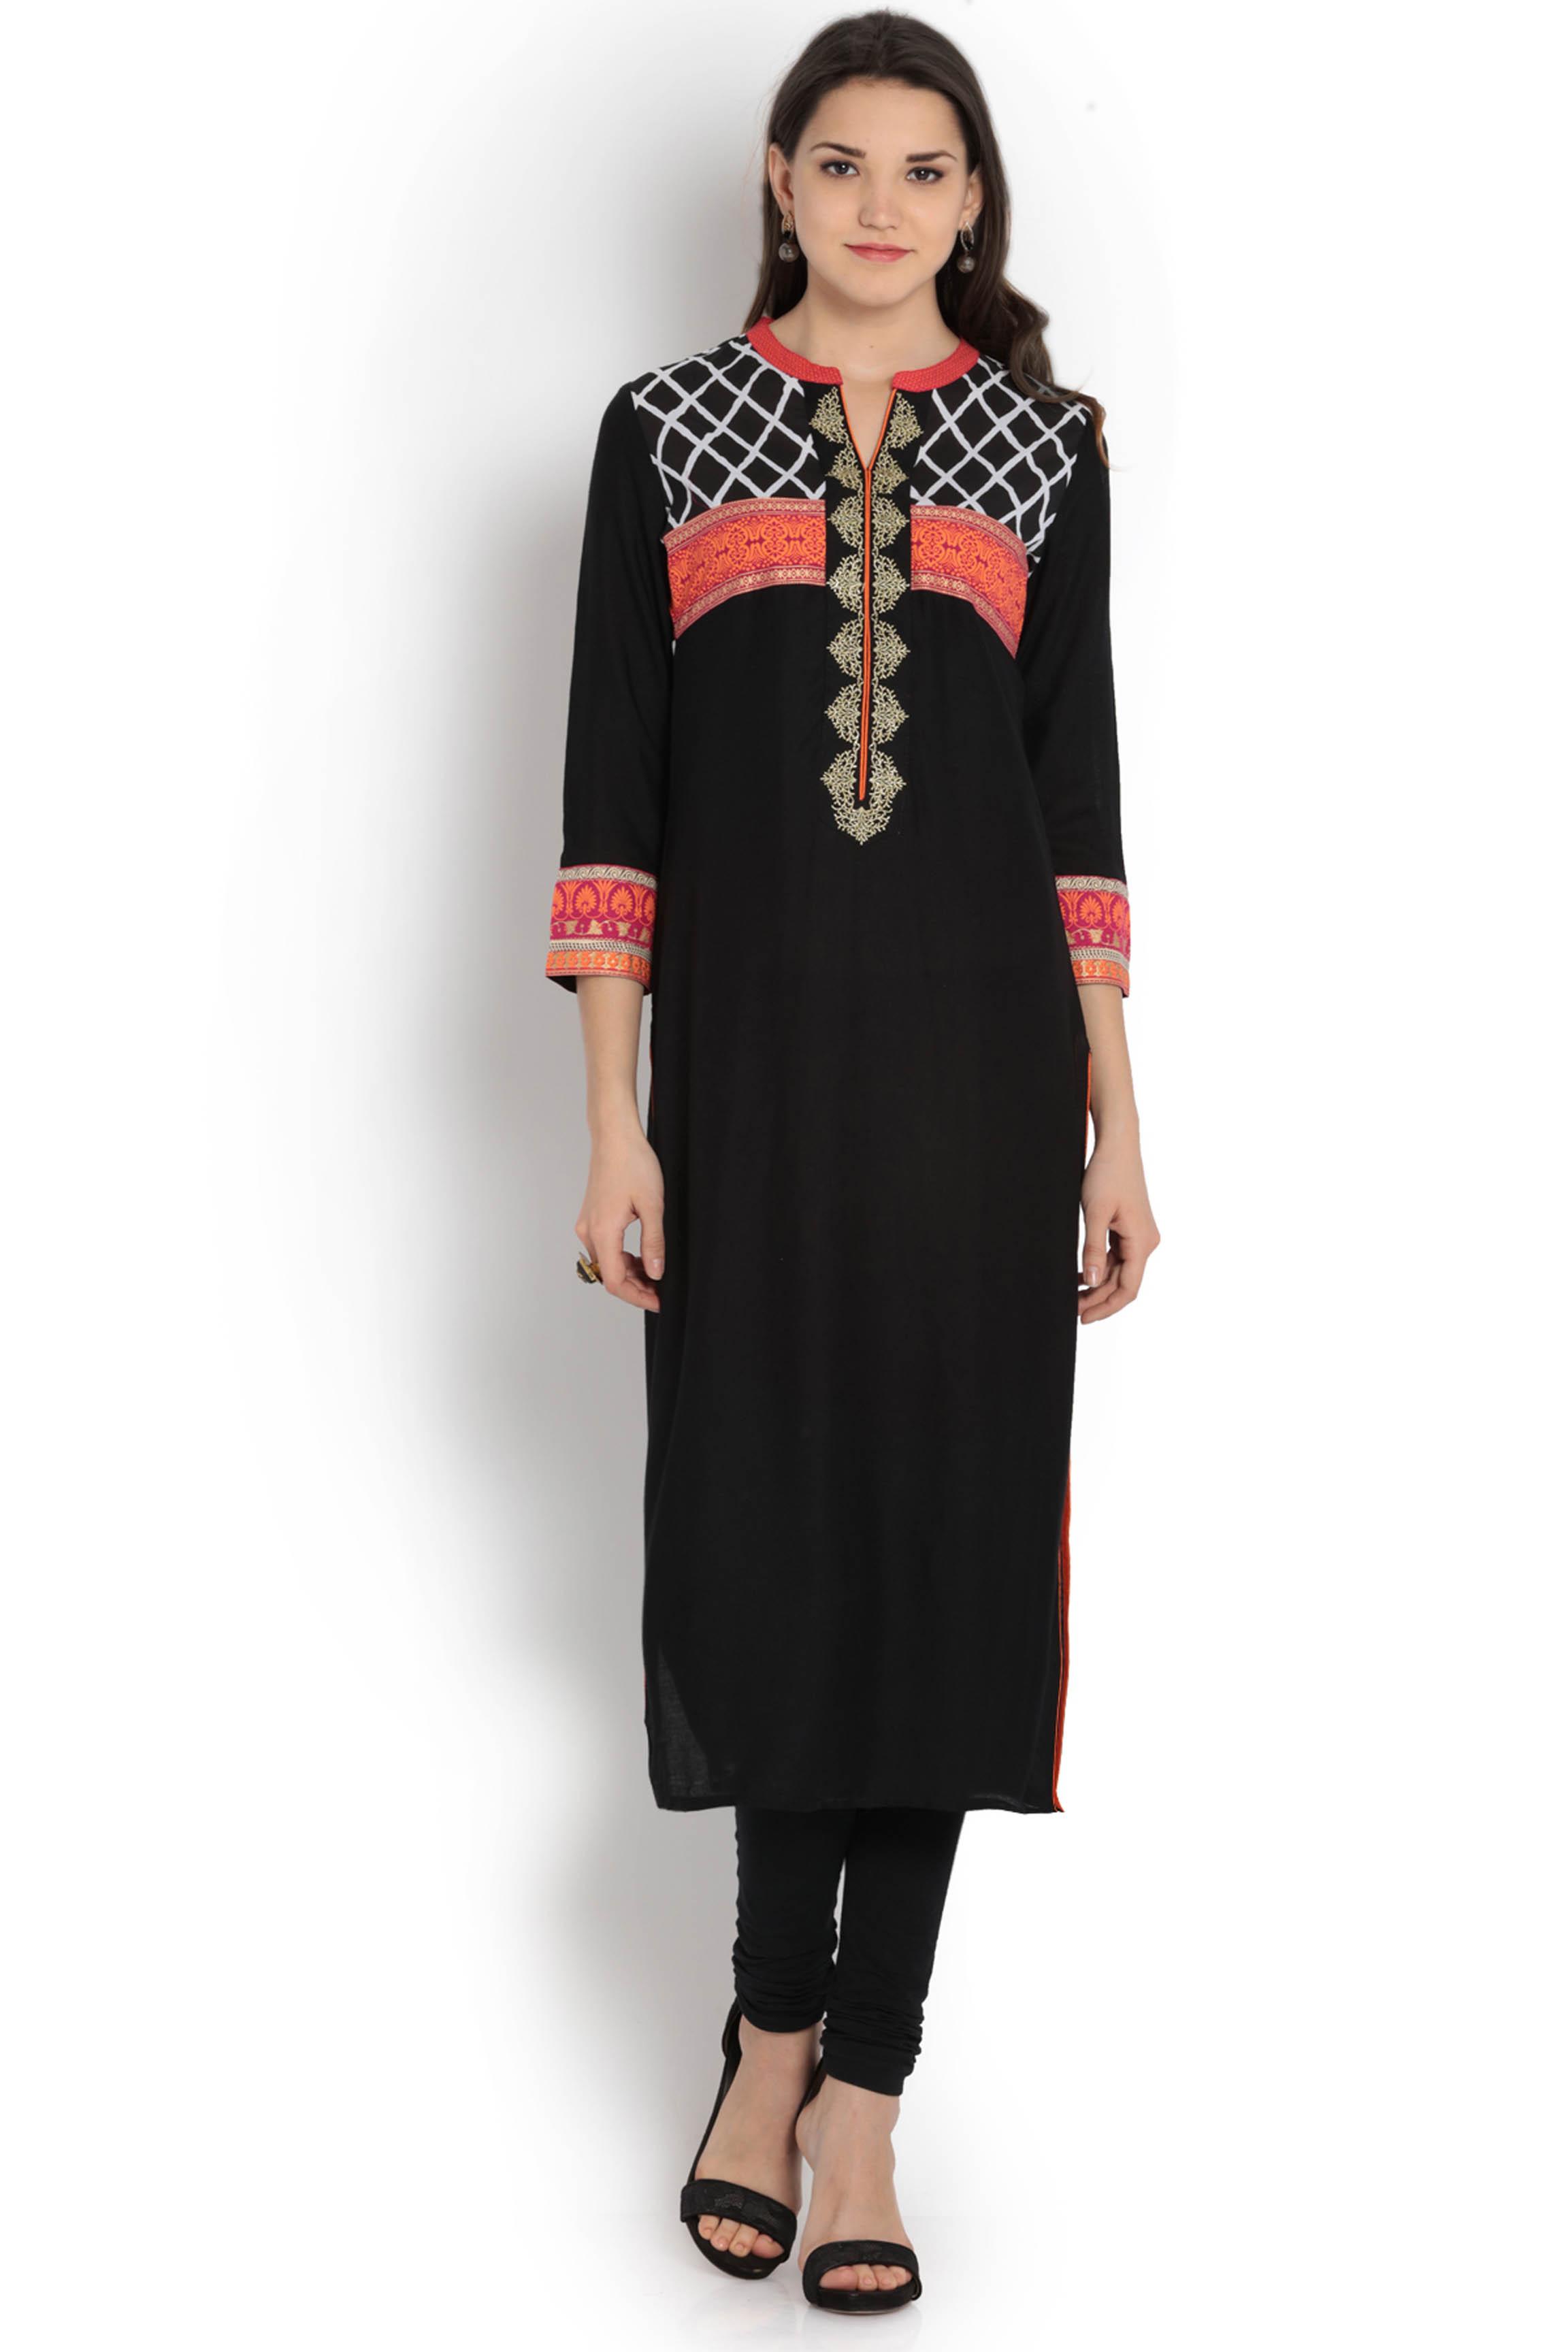 soch-black-and-red-rayon-straight-kurti-original